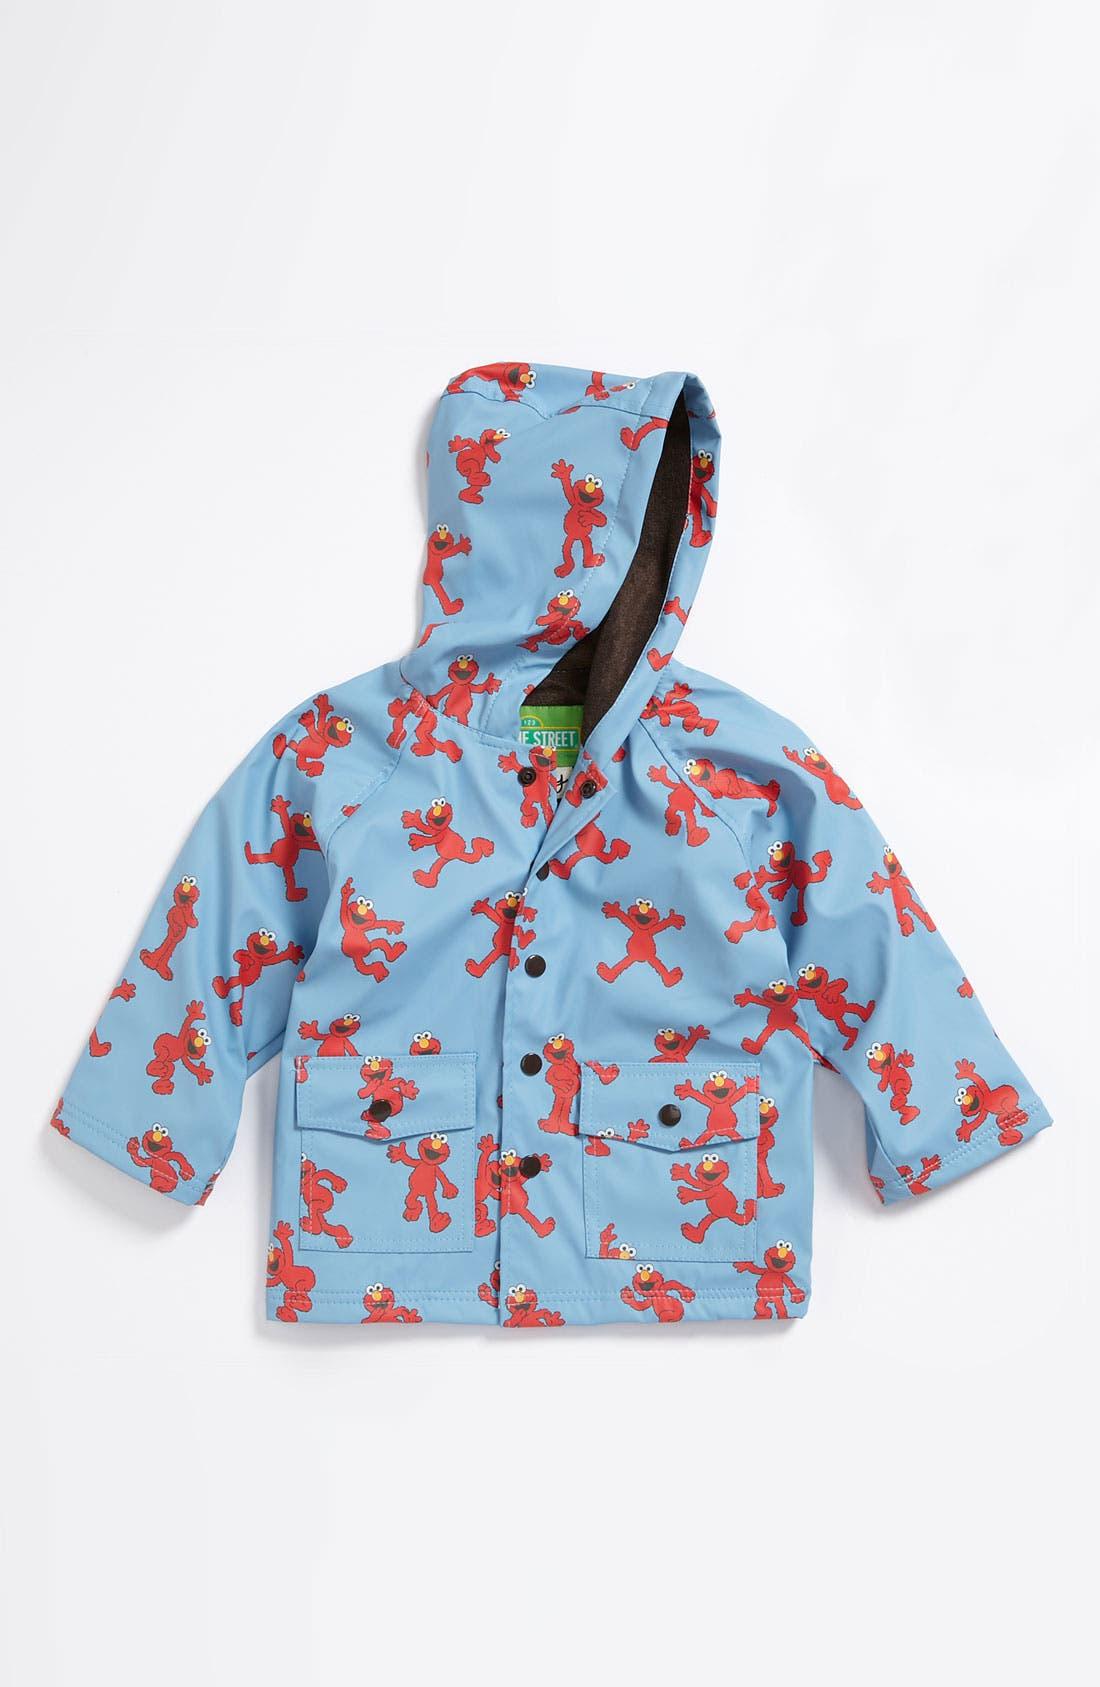 Main Image - Hatley 'Sesame Street® - Elmo' Raincoat (Toddler)